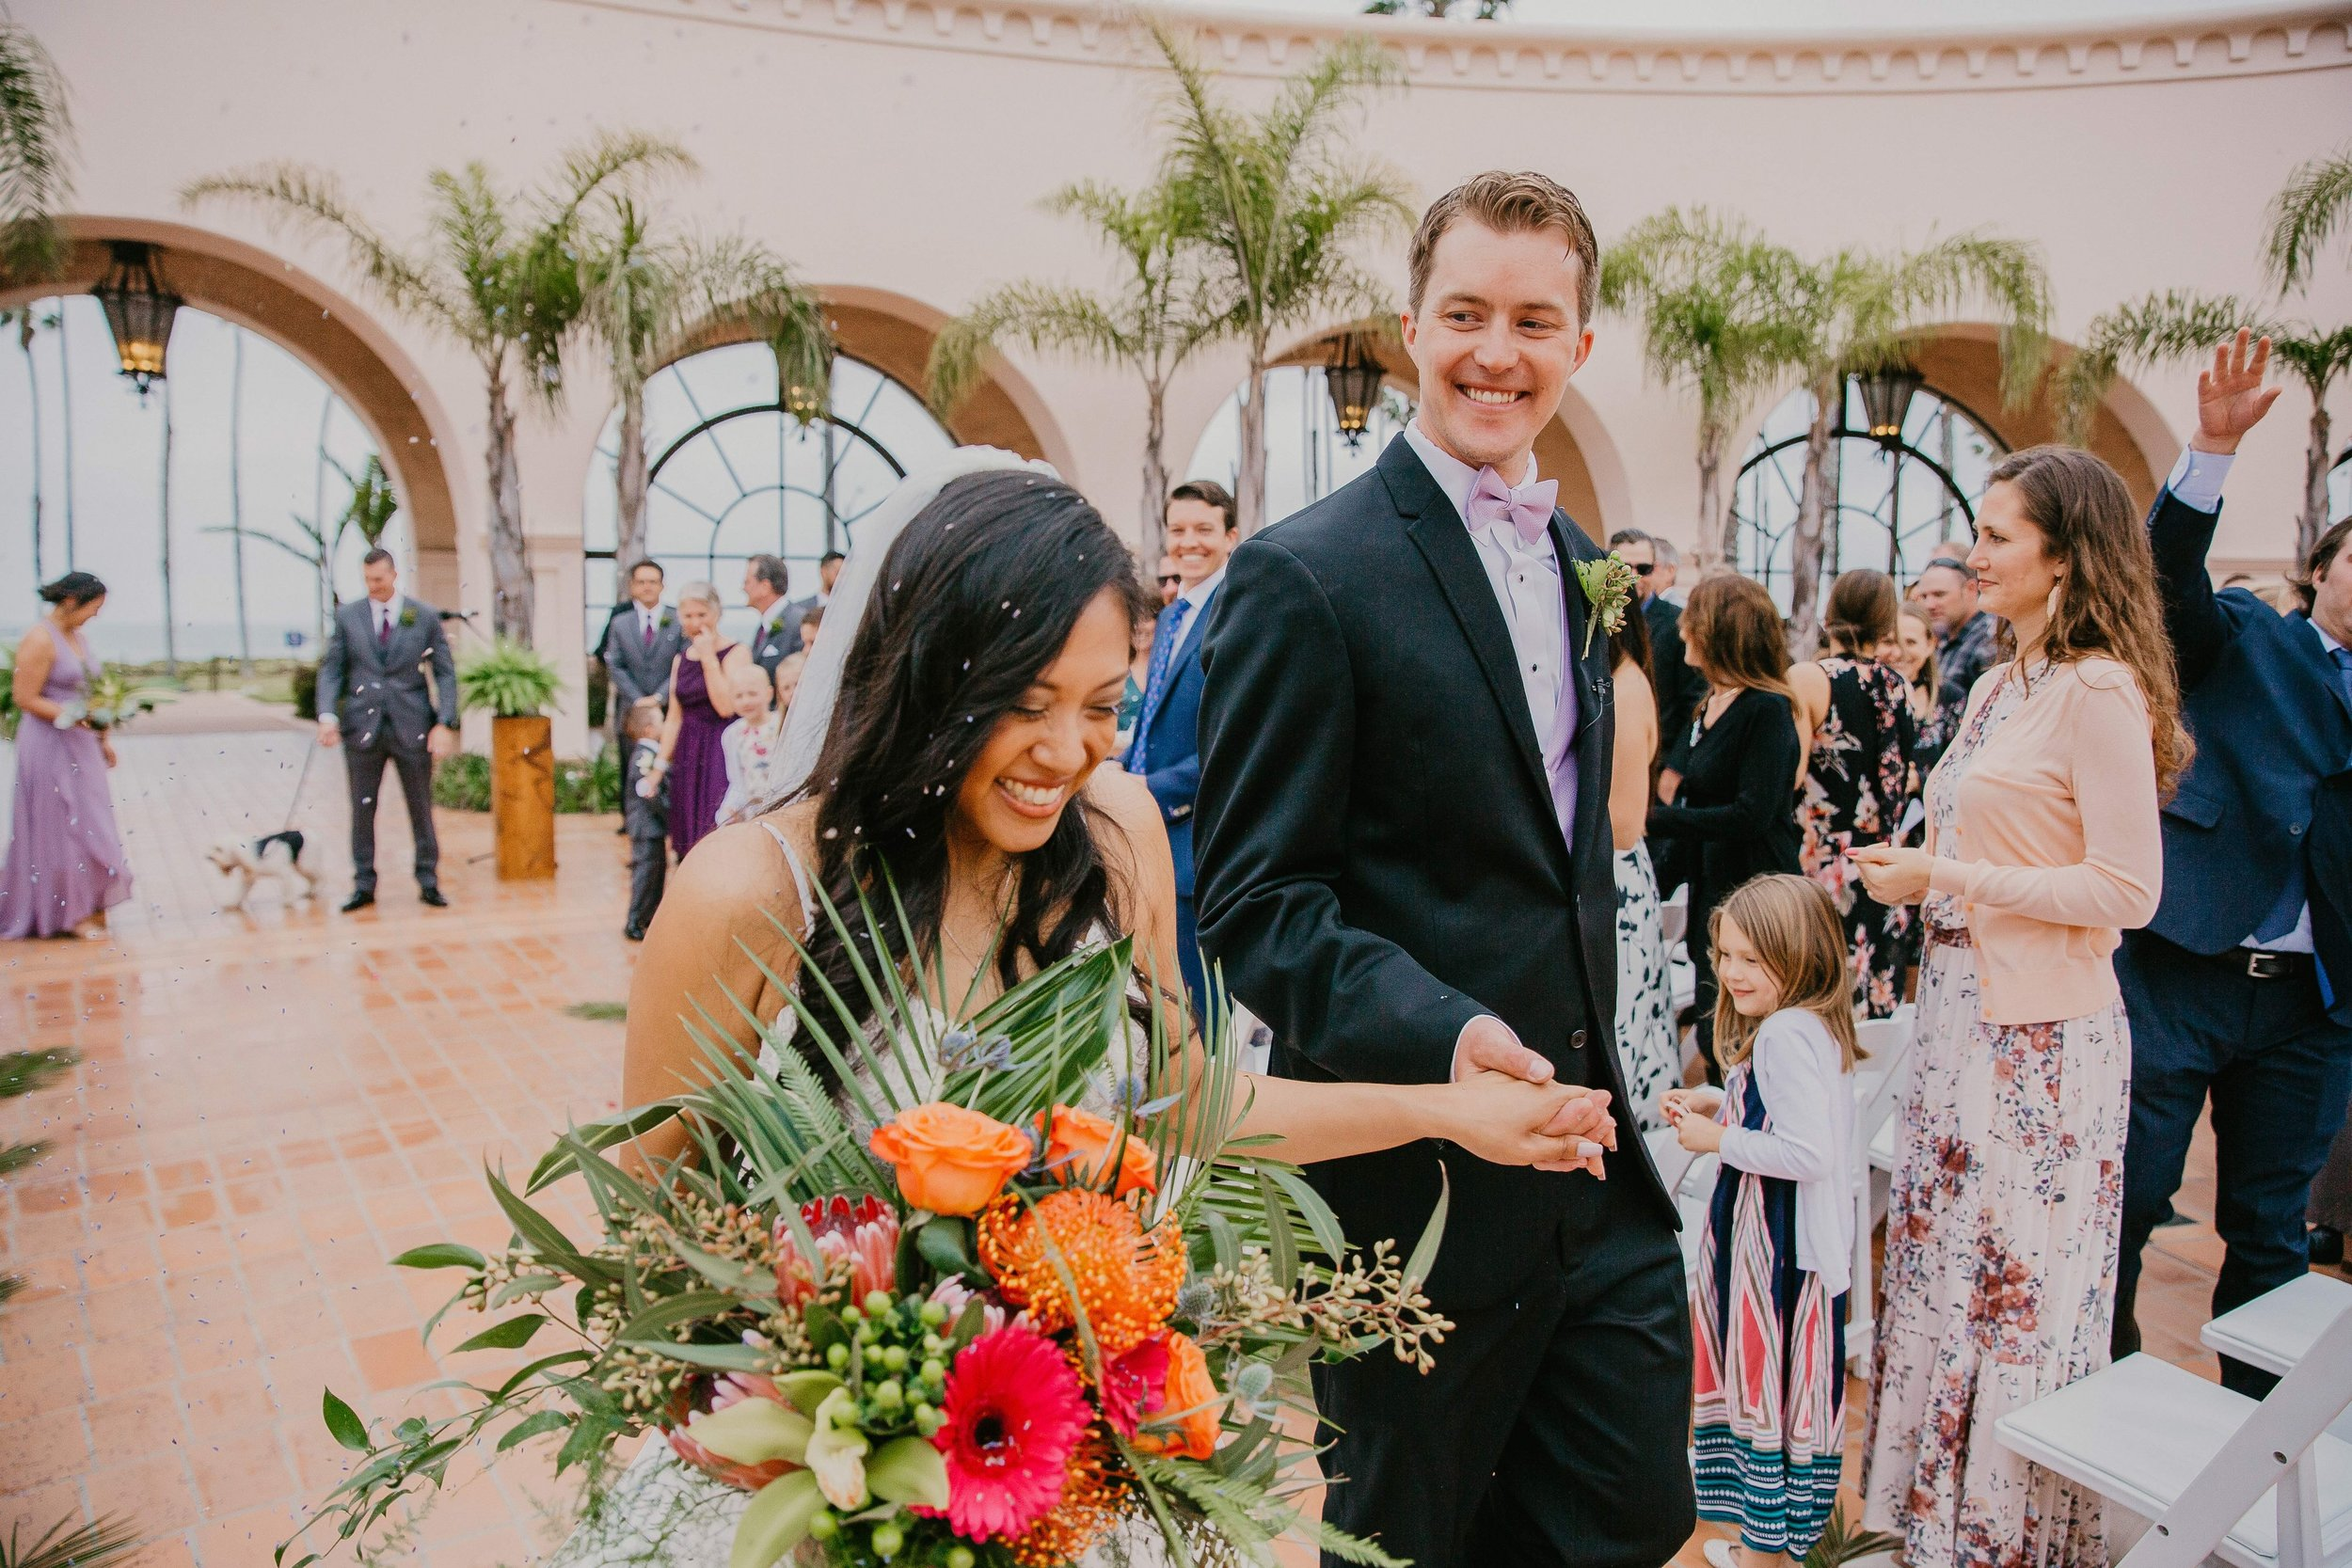 www.santabarbarawedding.com | Candice Marie Photography | Hilton Santa Barbara Beachfront Resort | Dalina Klan | Once in a Lifetime Weddings | Alpha Floral | Bride and Groom Leaving Ceremony